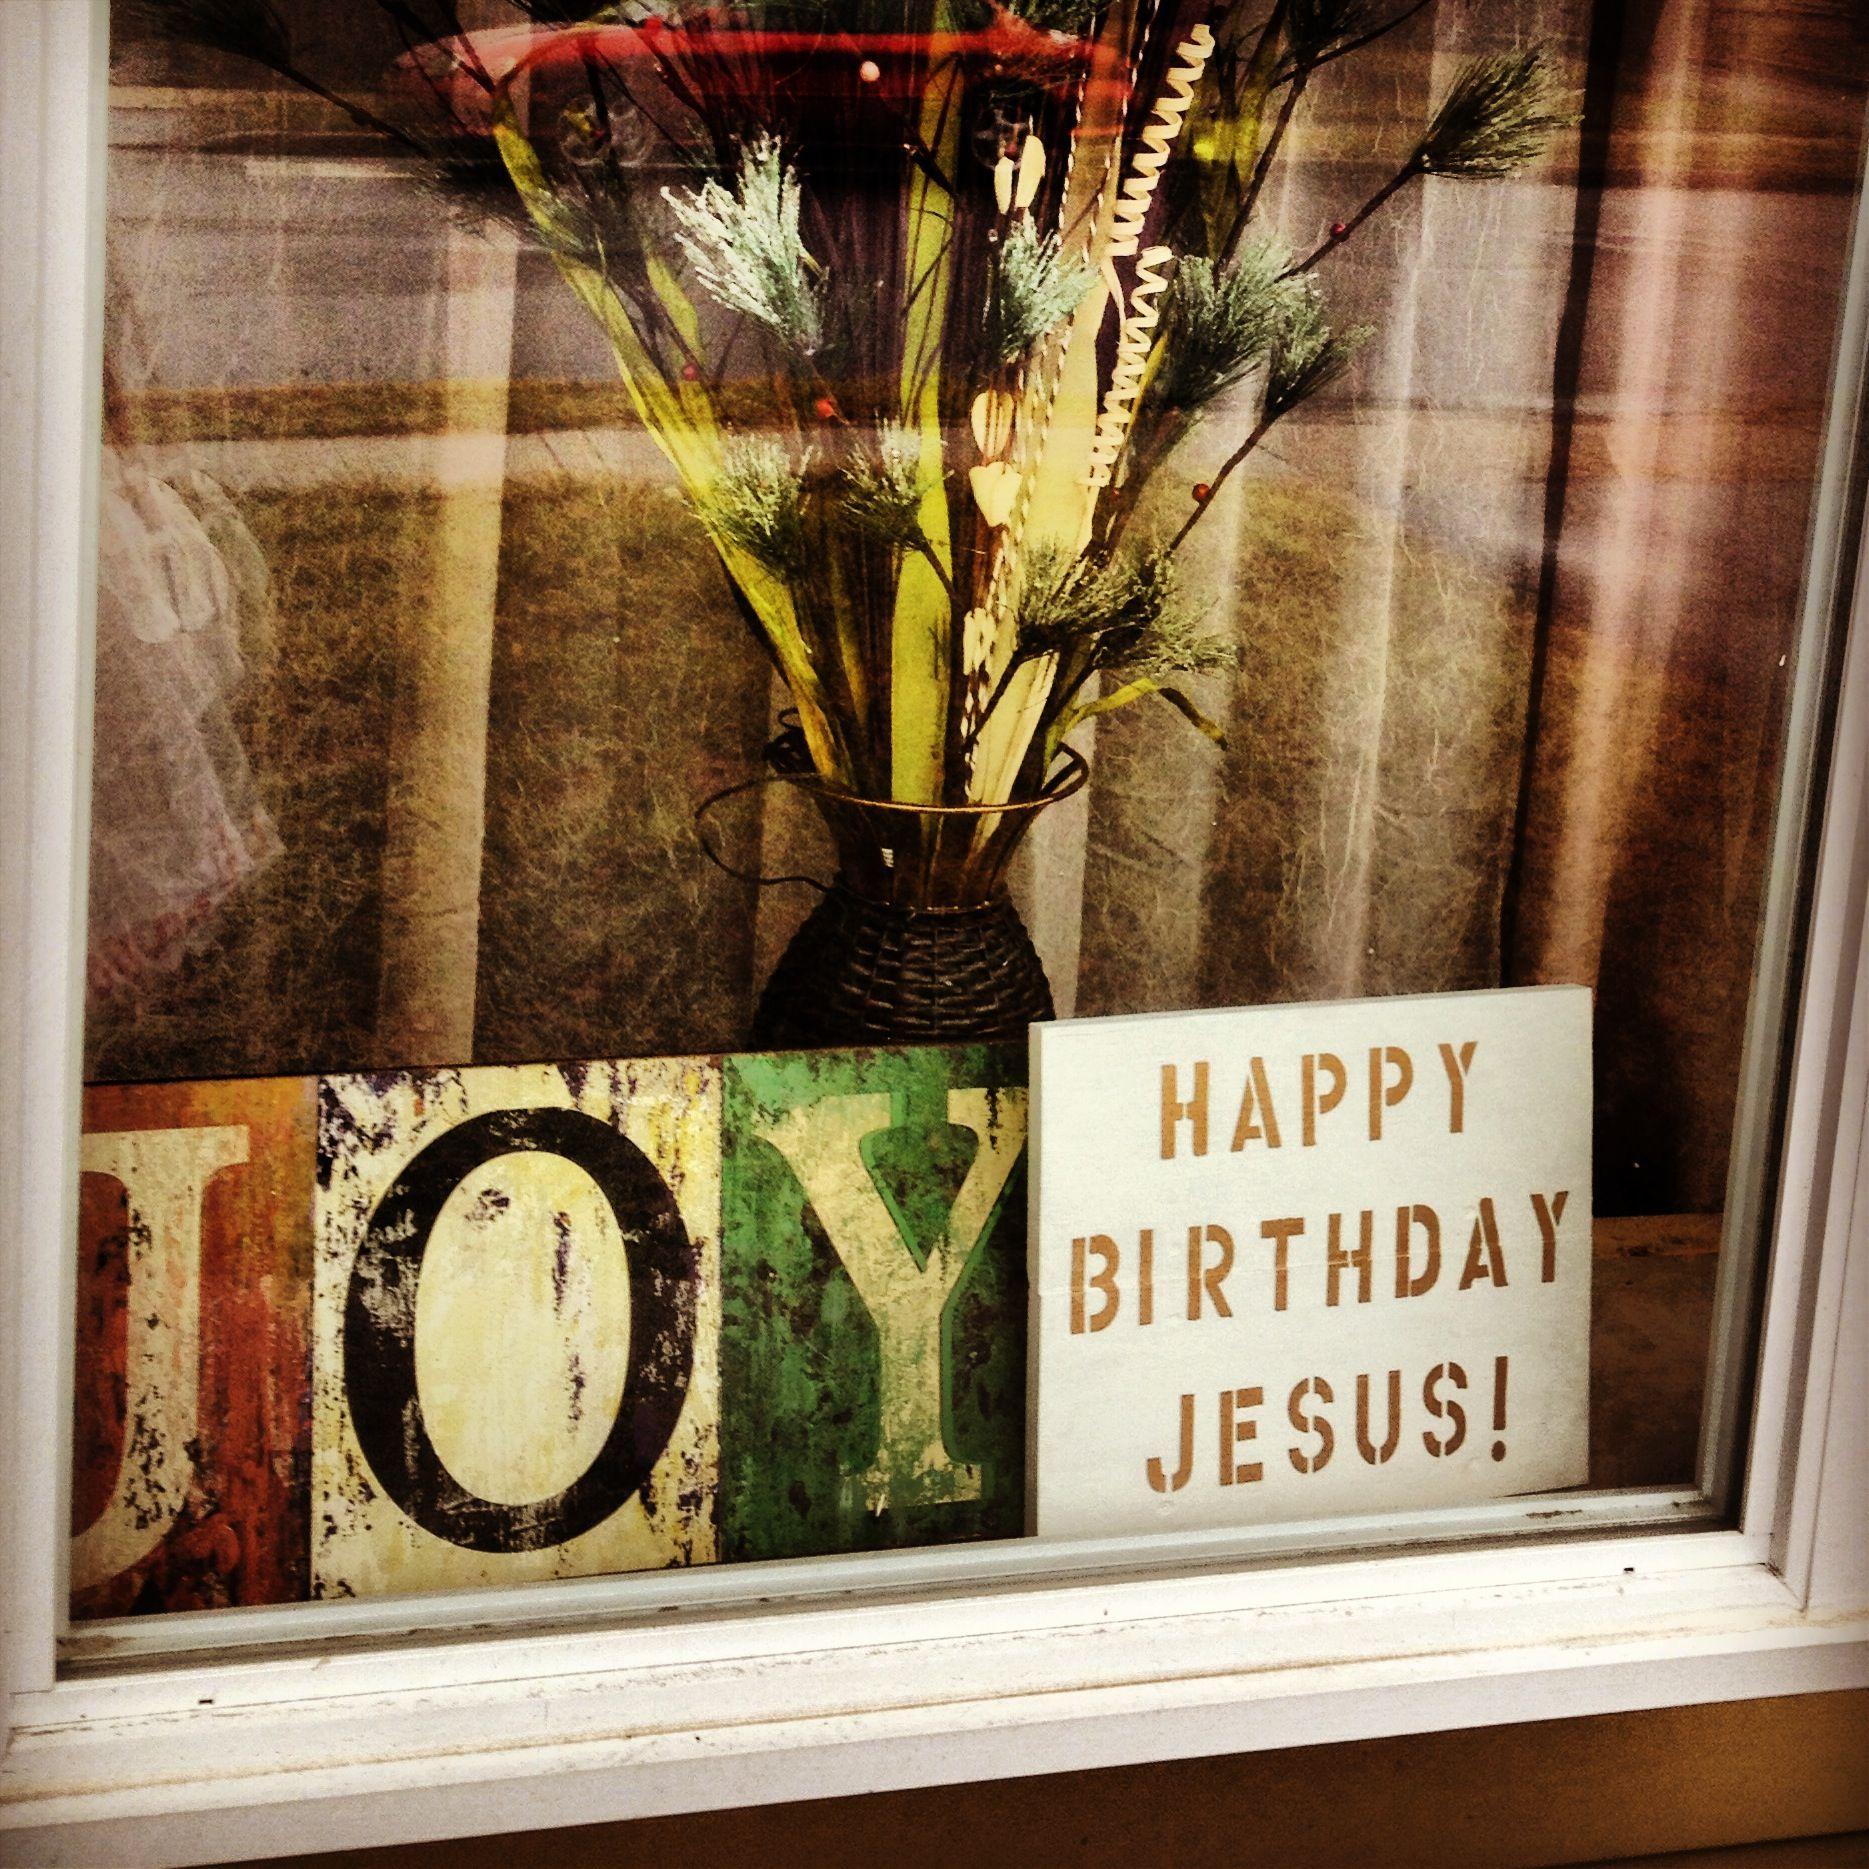 Happy birthday Jesus sign. Christmas.